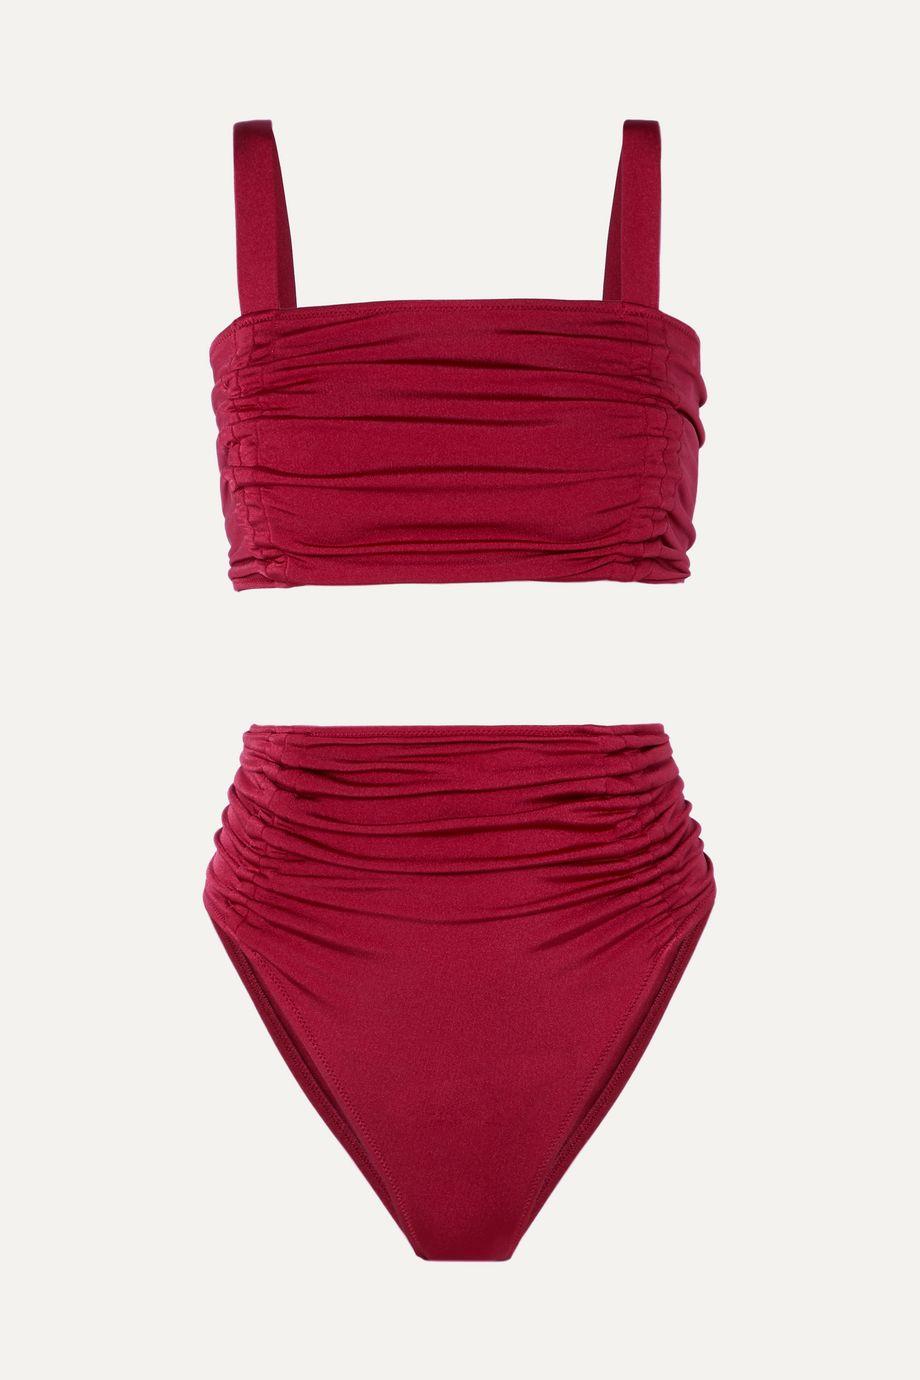 OYE Swimwear Alectrona ruched bikini